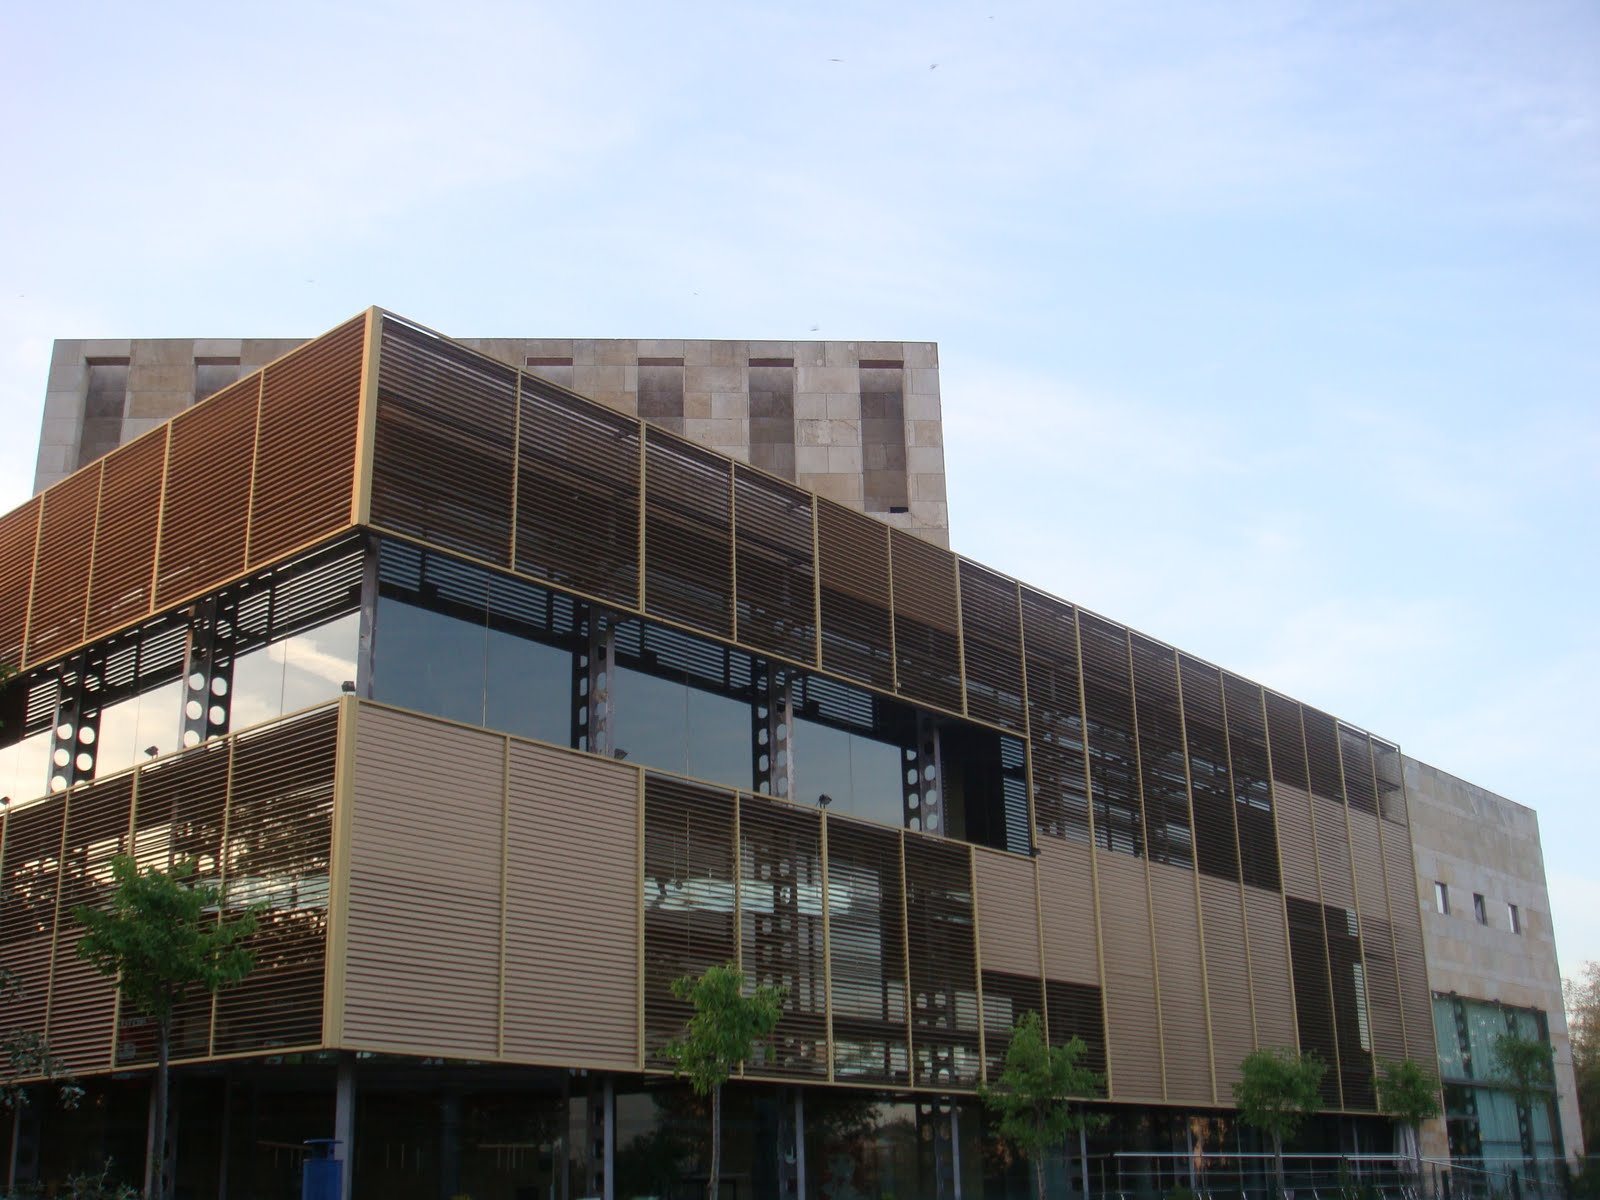 Sevilla contempor nea teatro central for Sala 0 teatro sevilla